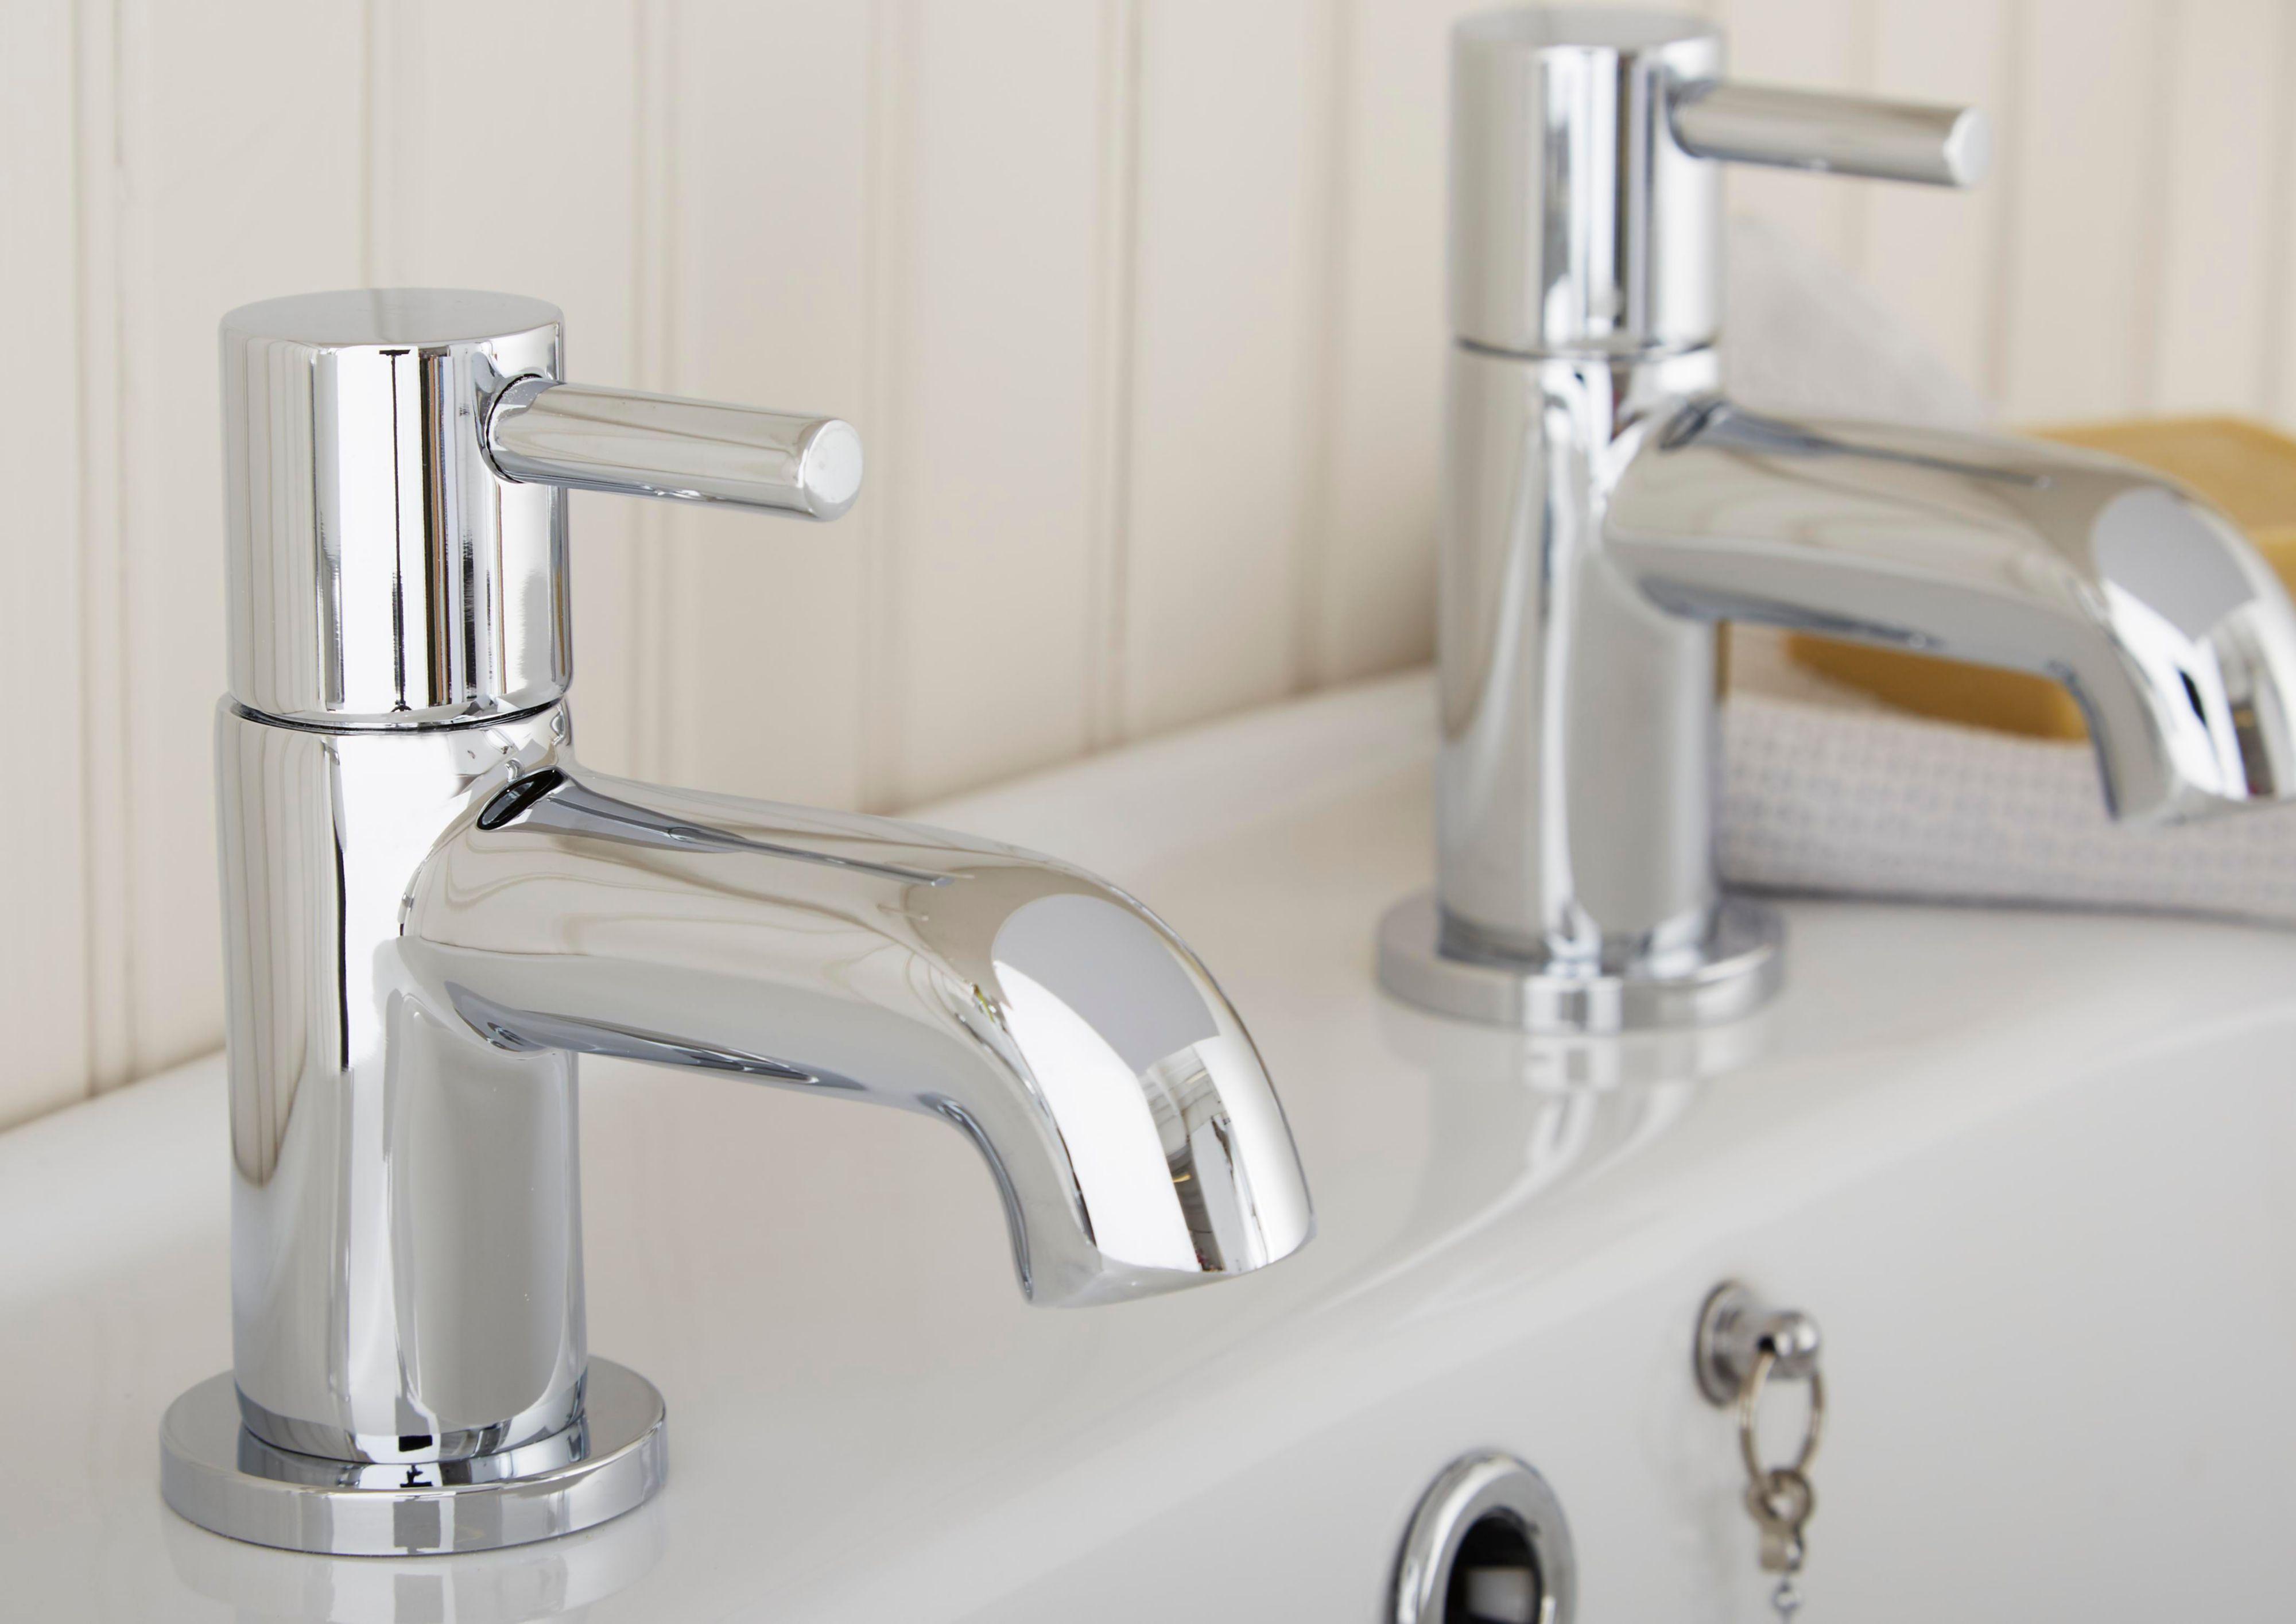 contemporary and modern bathroom taps EHUCLWG